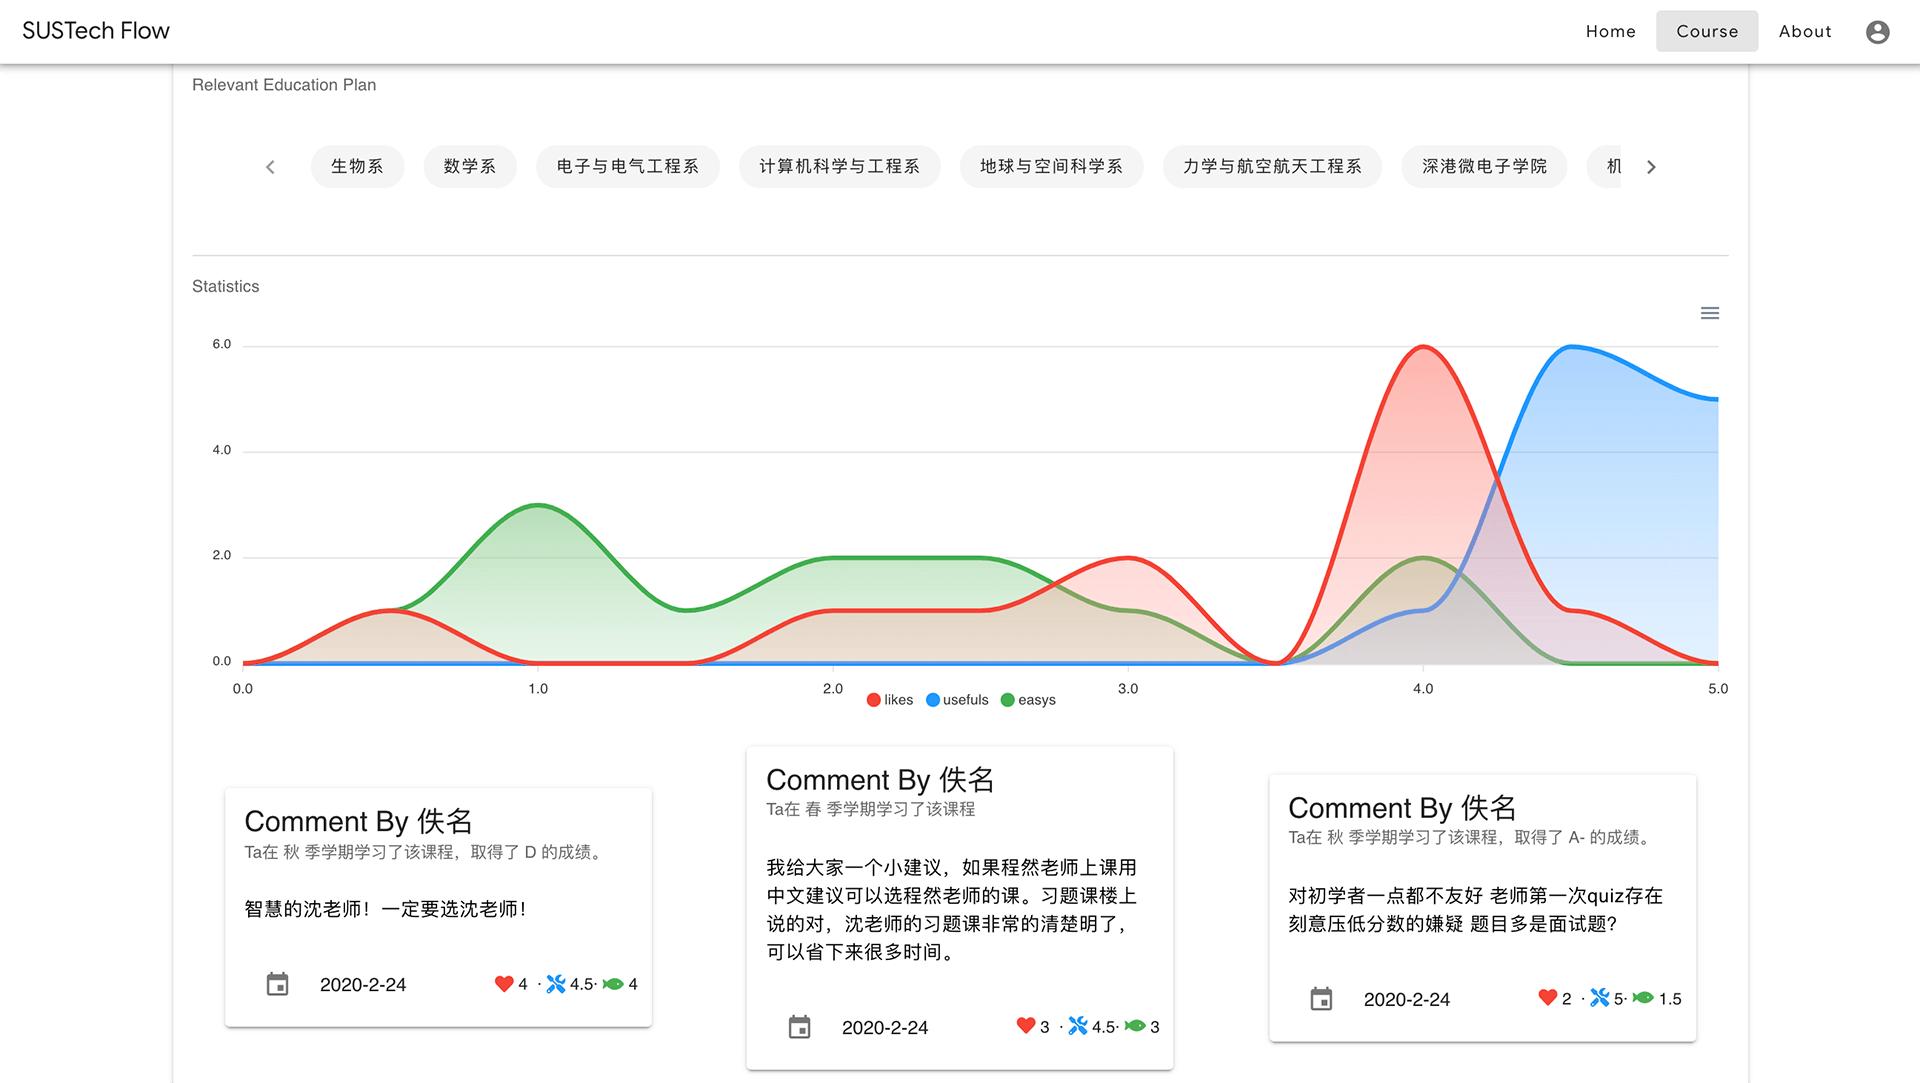 「课程评价」页面/SUSTechFlow